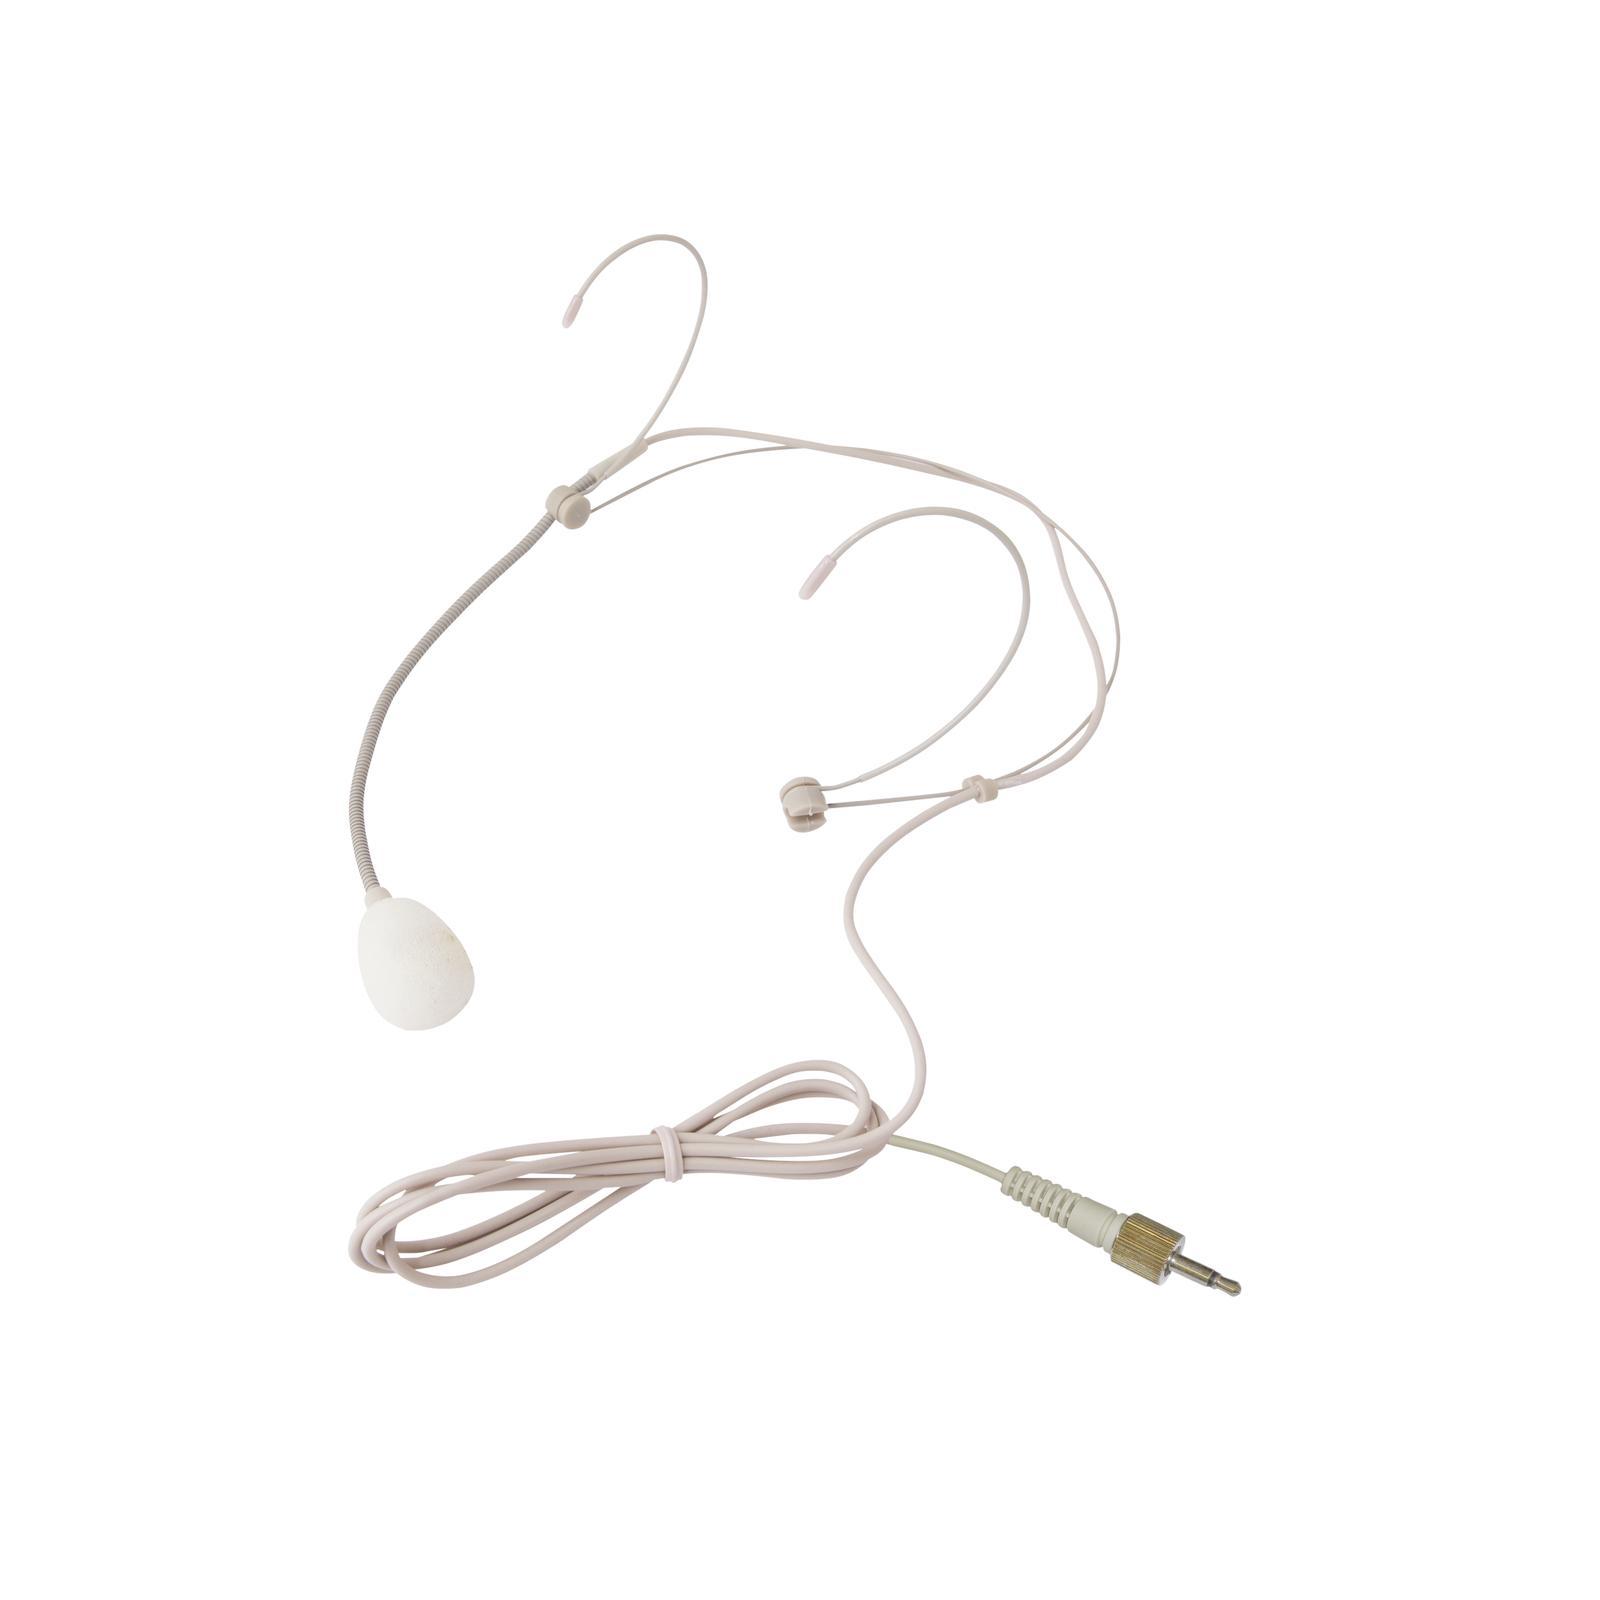 Omnitronic Uhf 200 Hs Headset Microphone Su